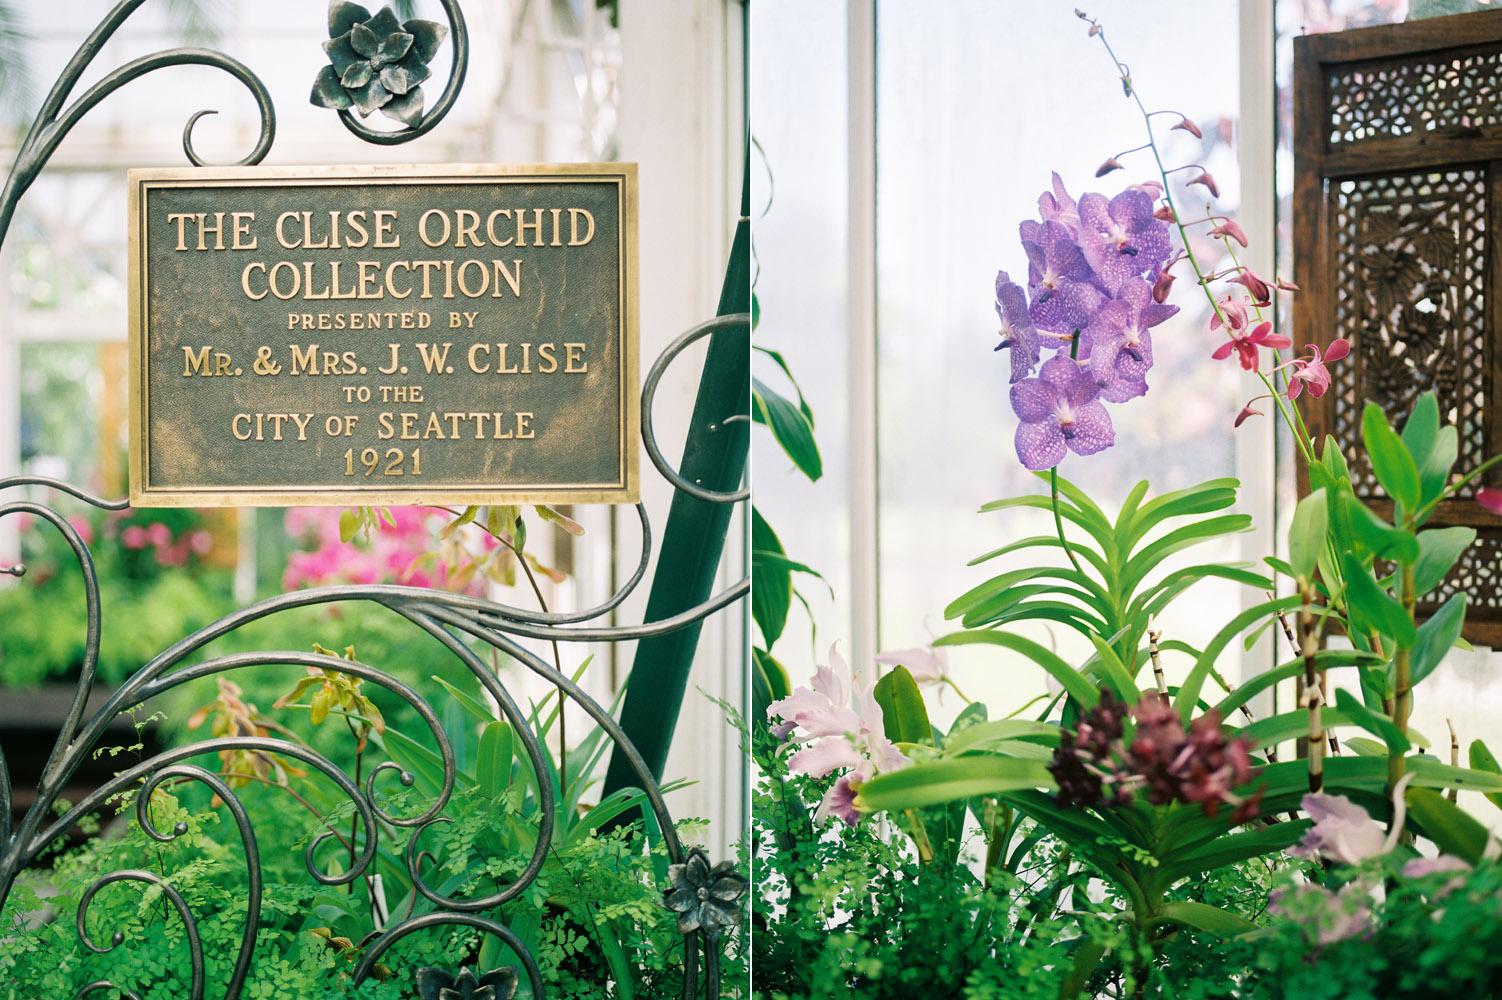 seattle volunteer park conservatory orchid garden kodak portra 800 film.jpg